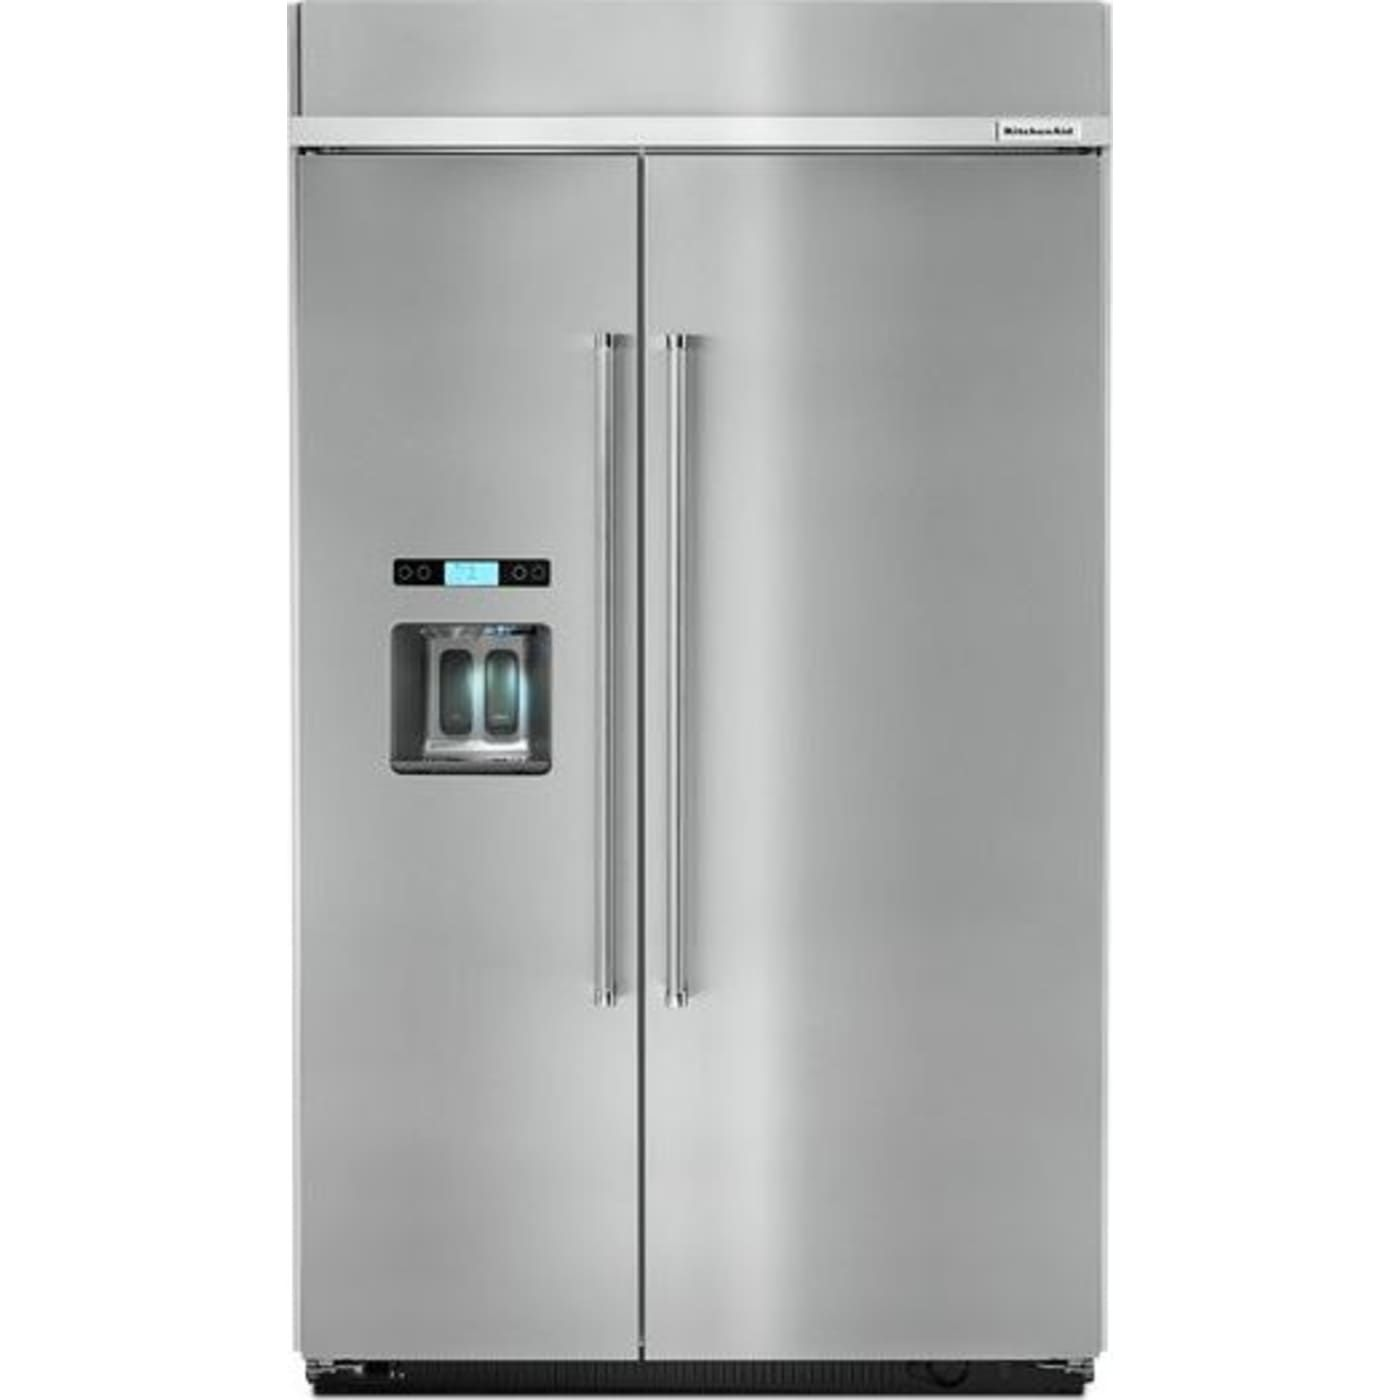 Kbsd608ess by kitchenaid sidebyside refrigerators